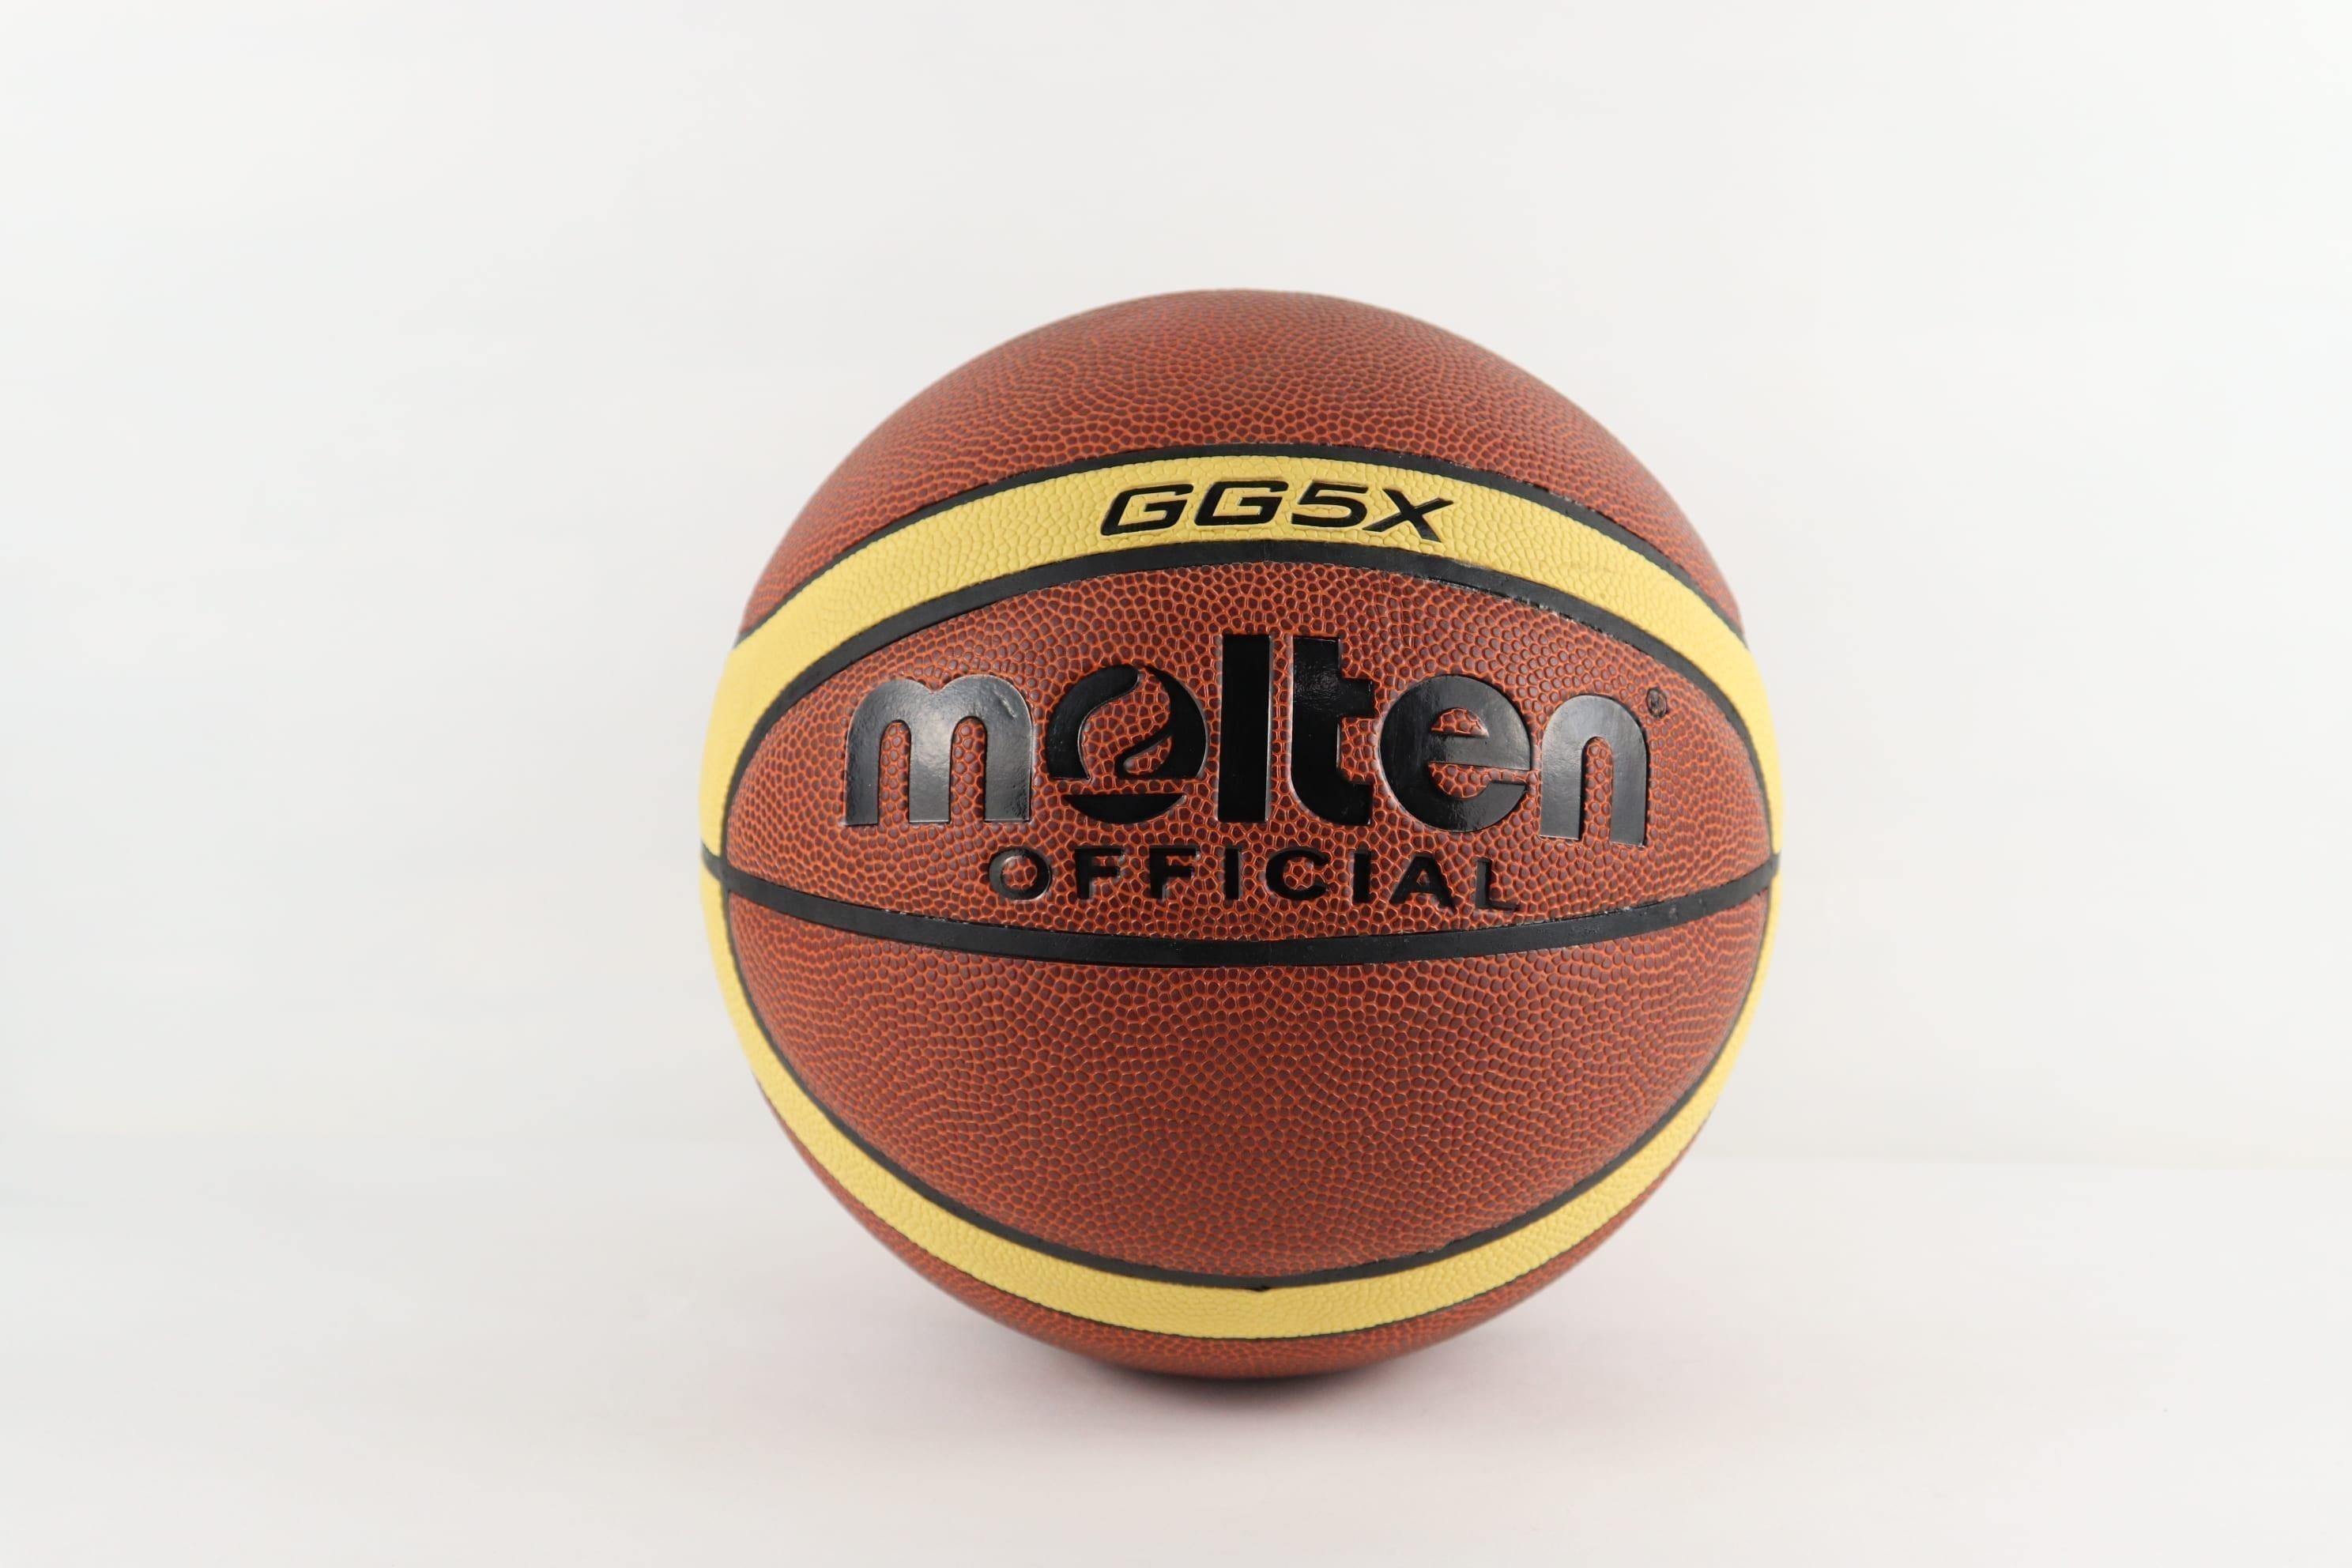 Molten Basketball BGM5X Size 5